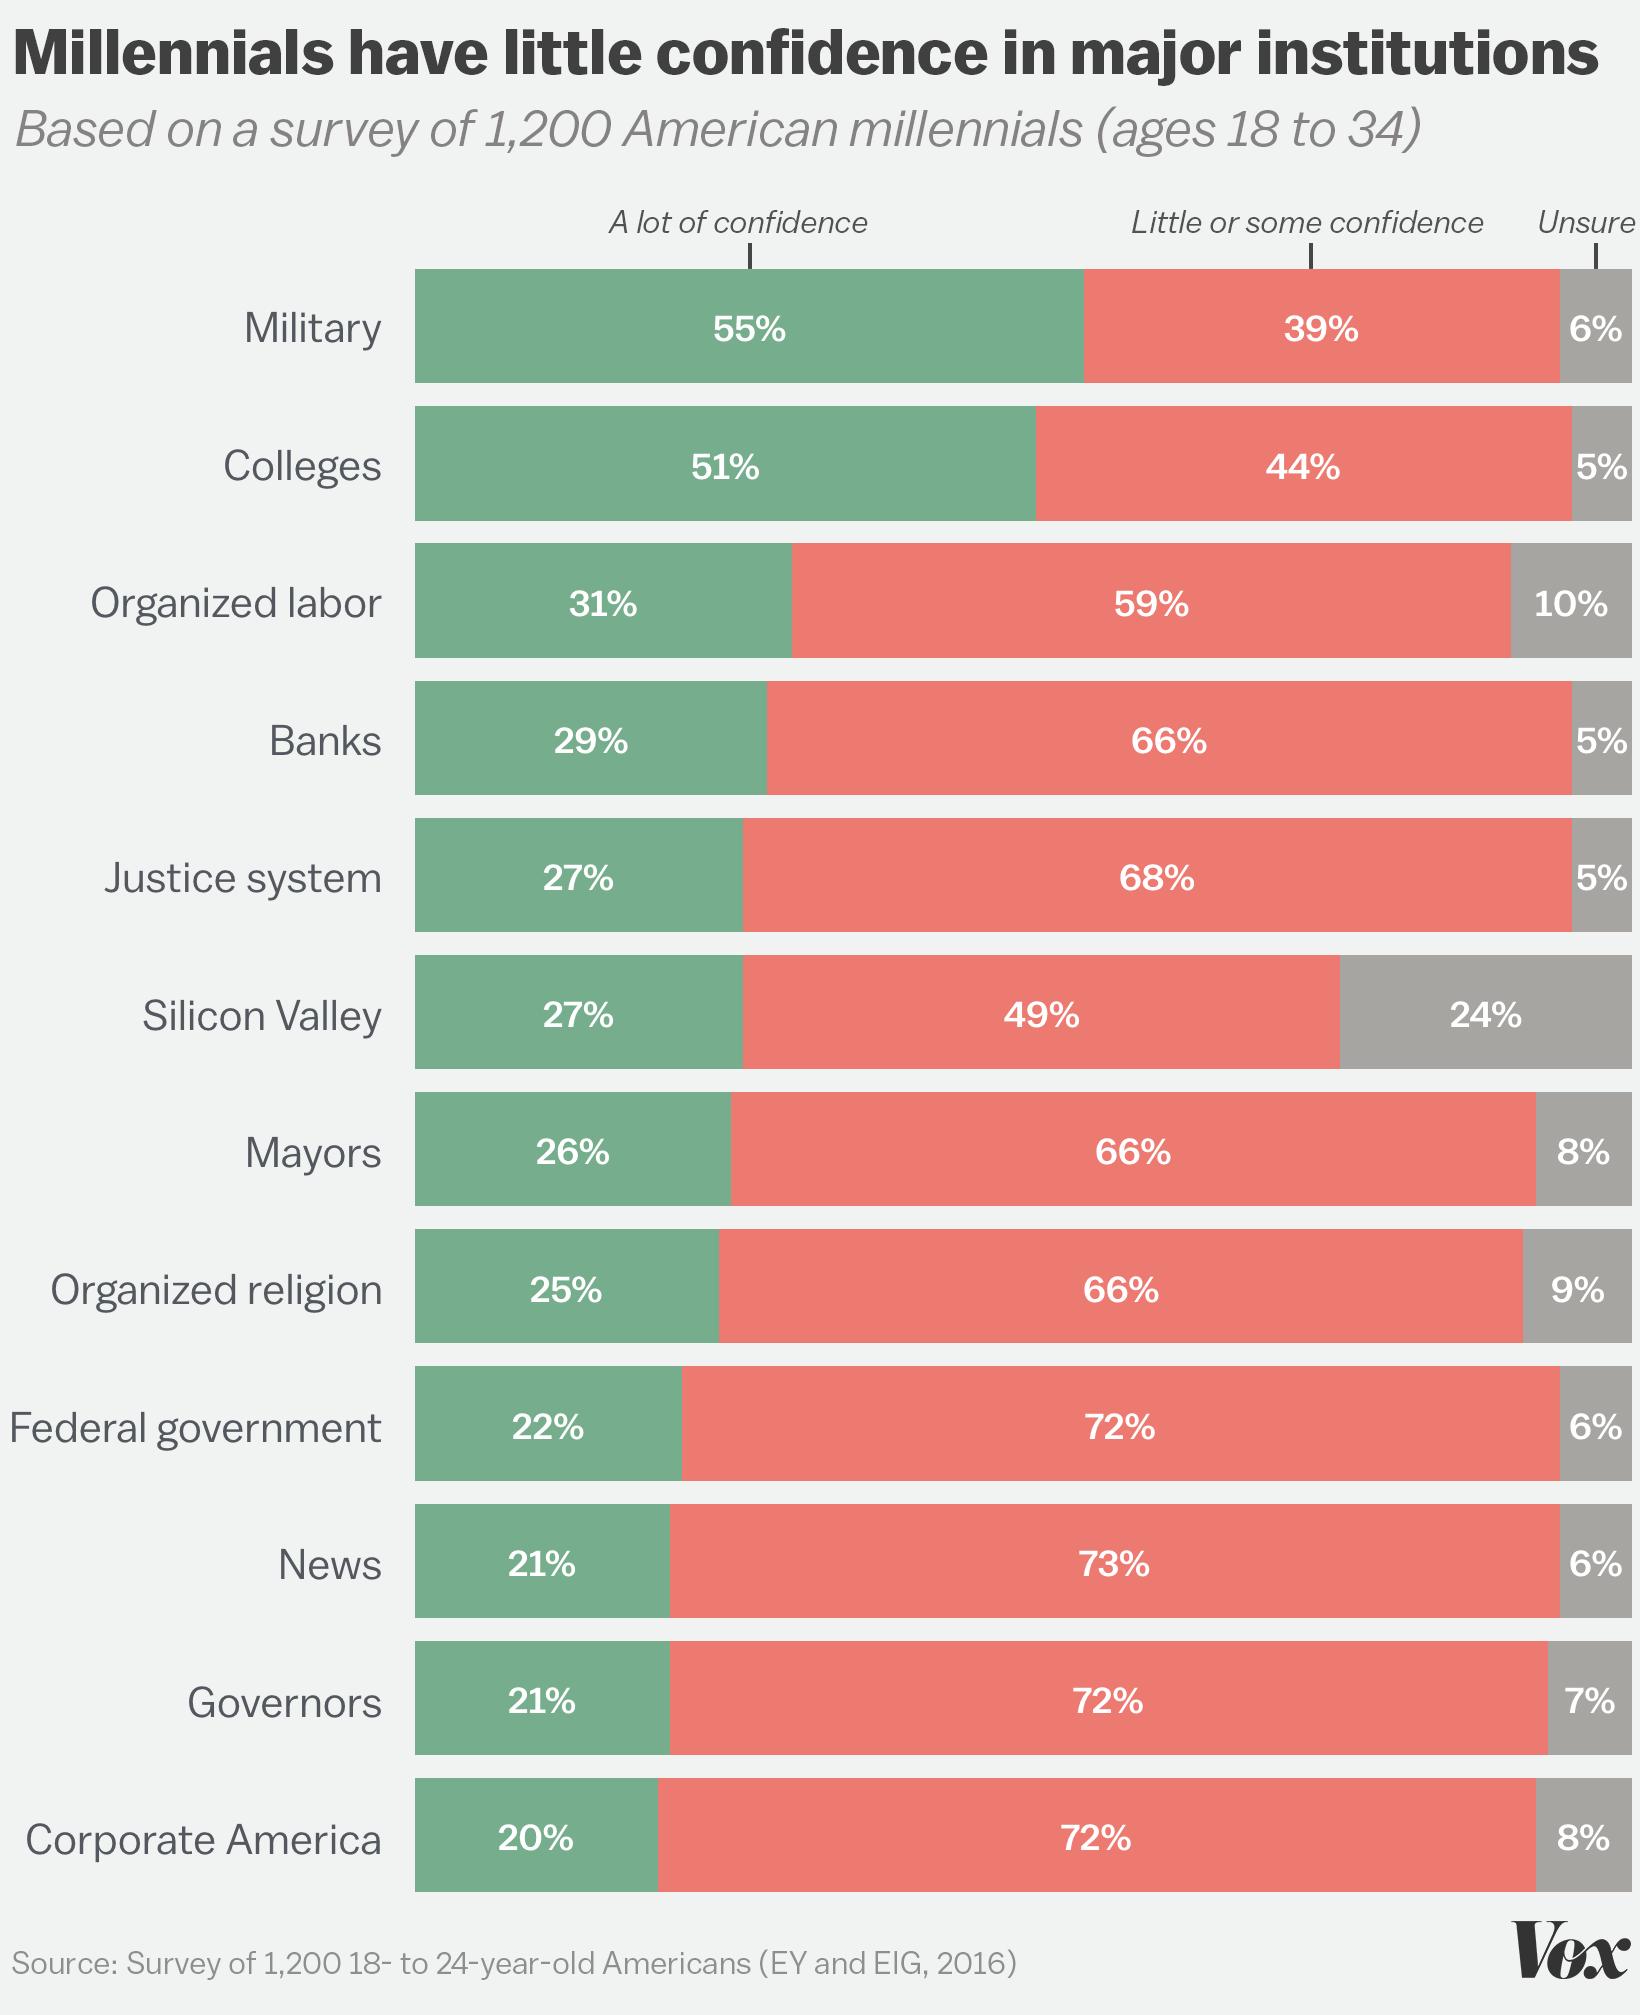 Do democrats have a confidence problem?